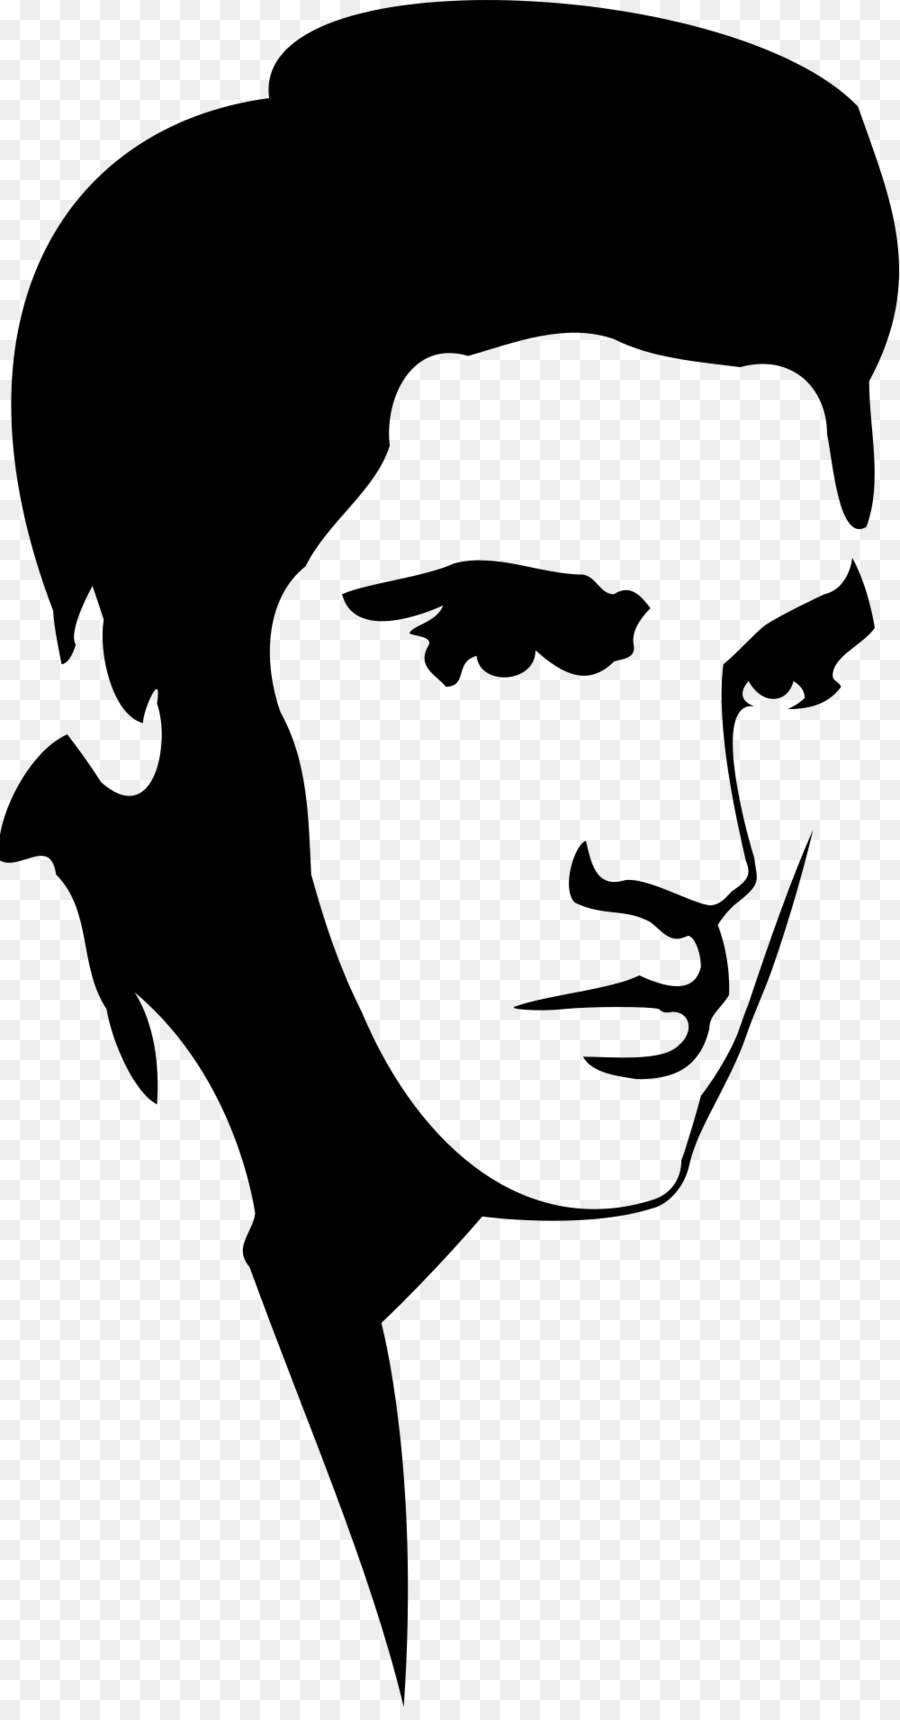 elvis presley stencil silhouette clip art elvis png download rh kisspng com elvis clip art black and white elvis clip art black and white